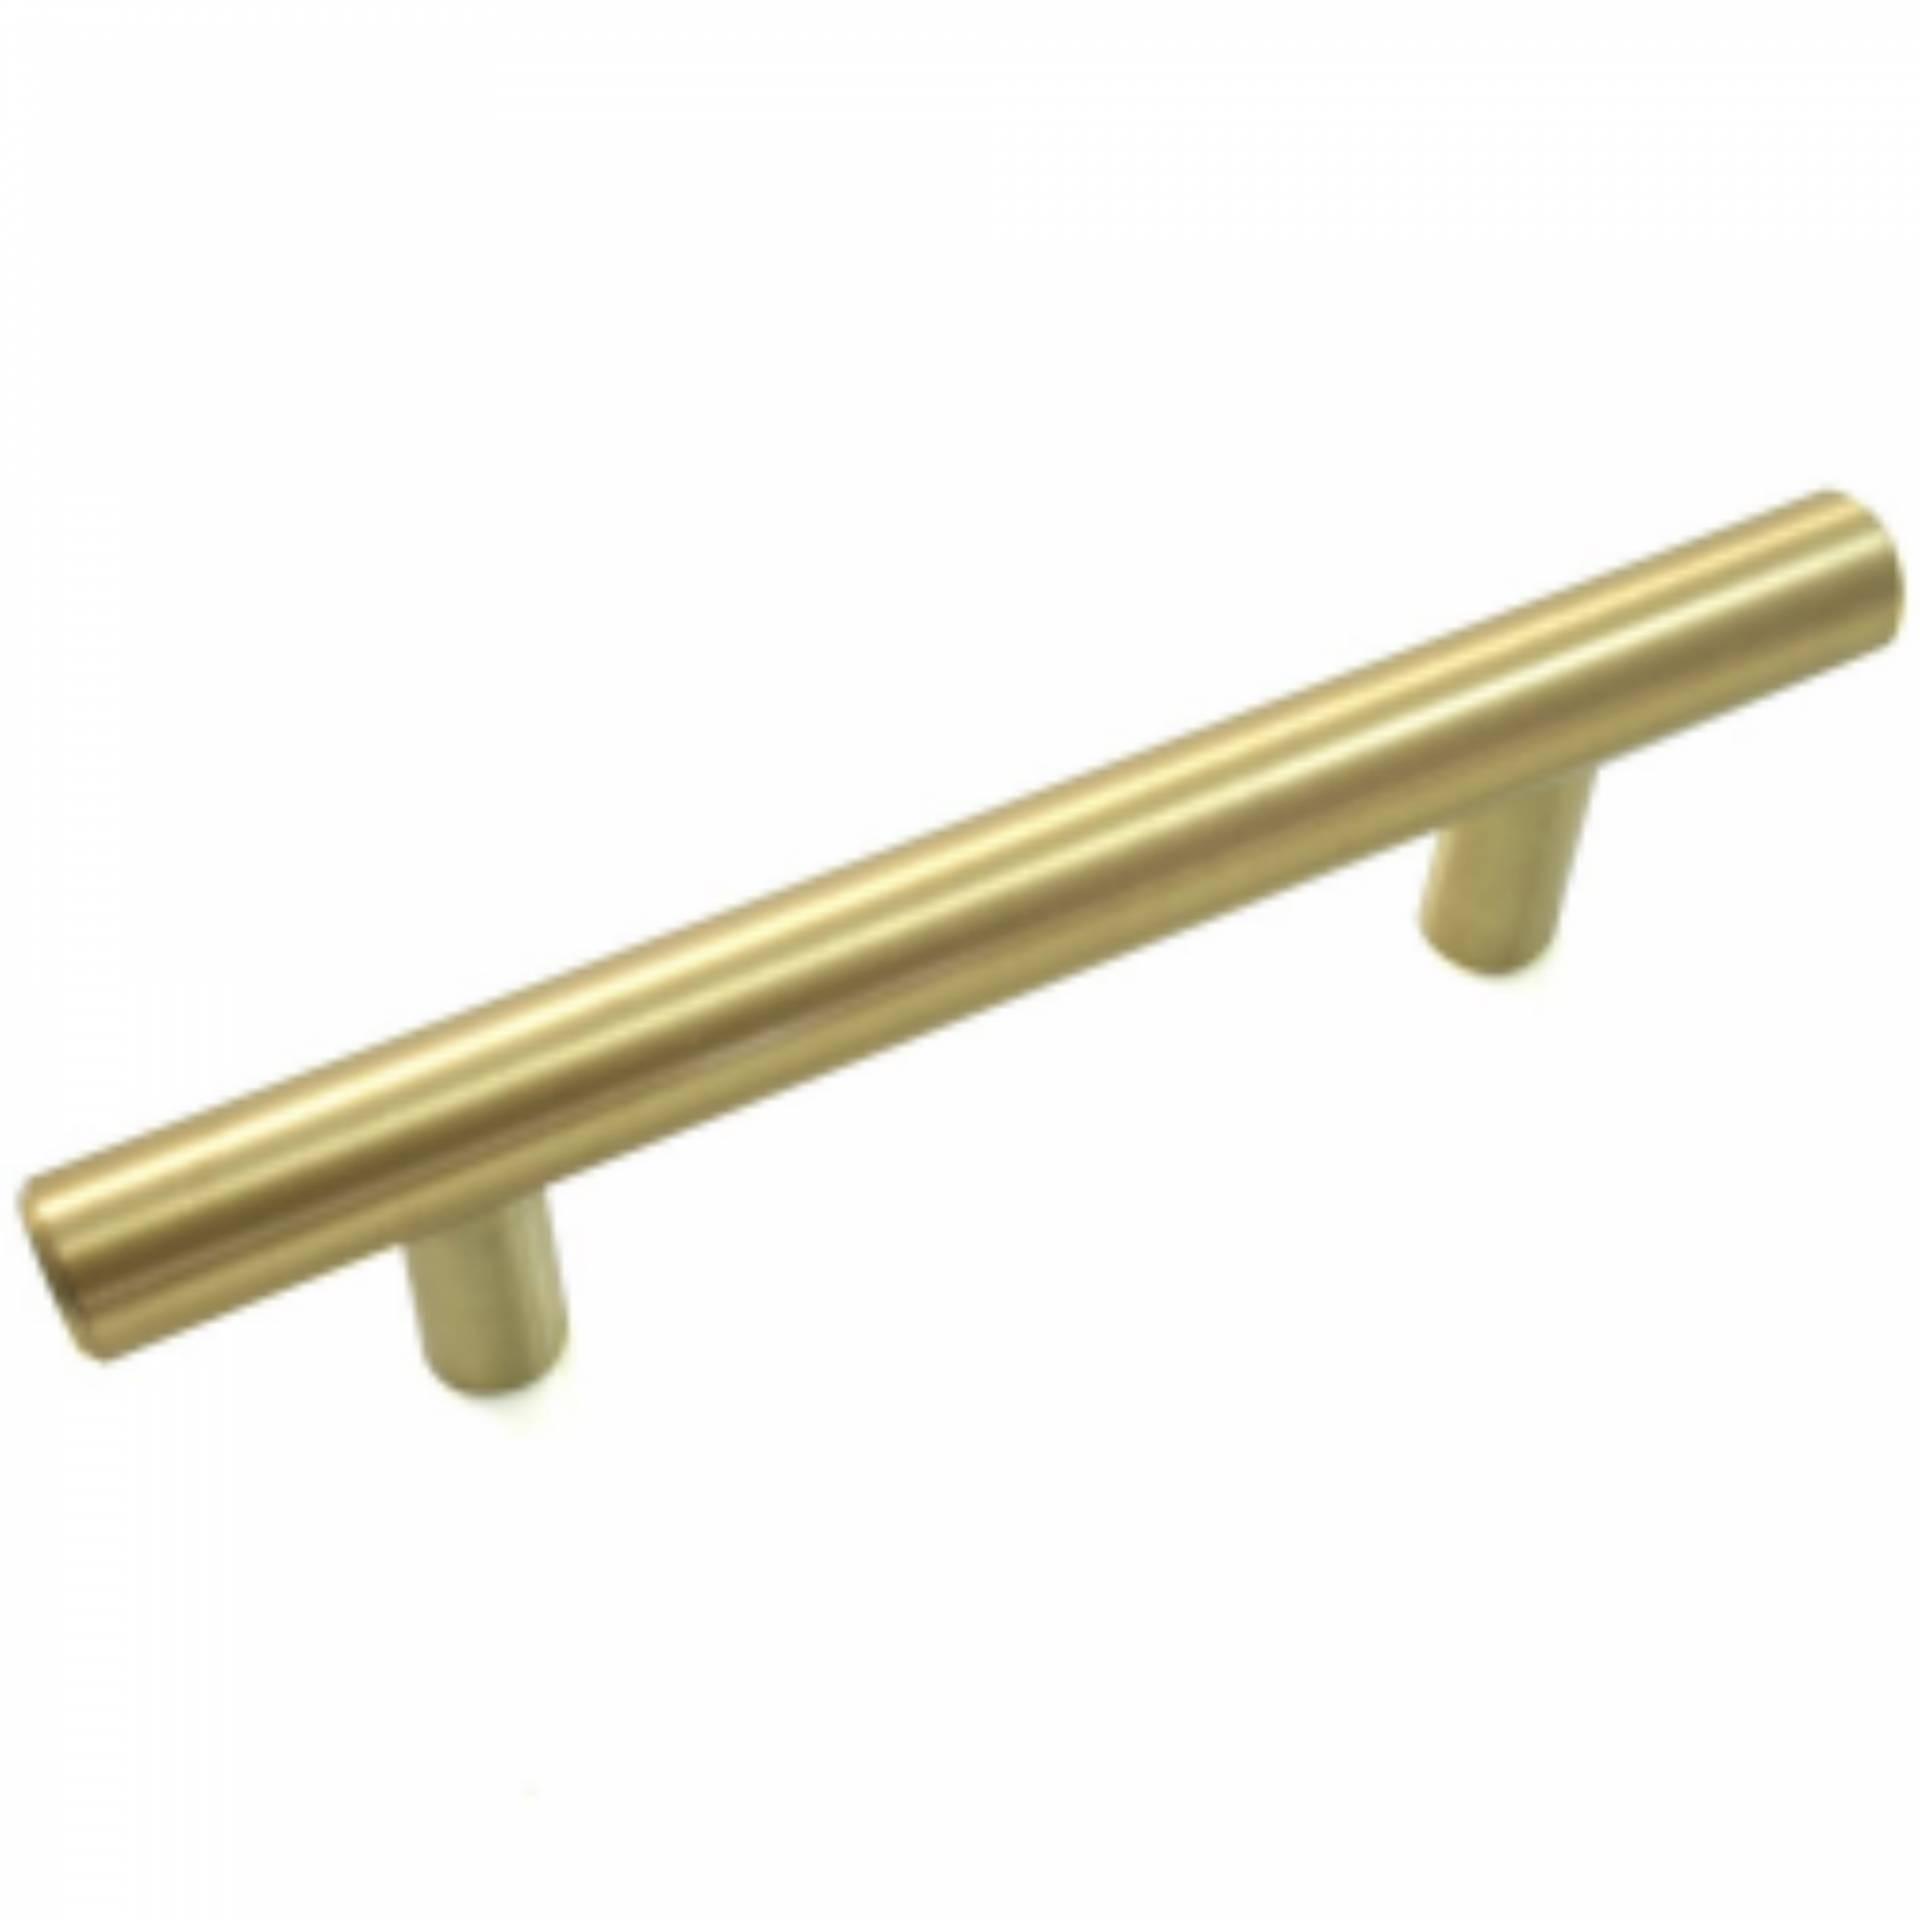 96mm Satin Brass T Bar Cabinet Pull Heeby S Surplus Inc